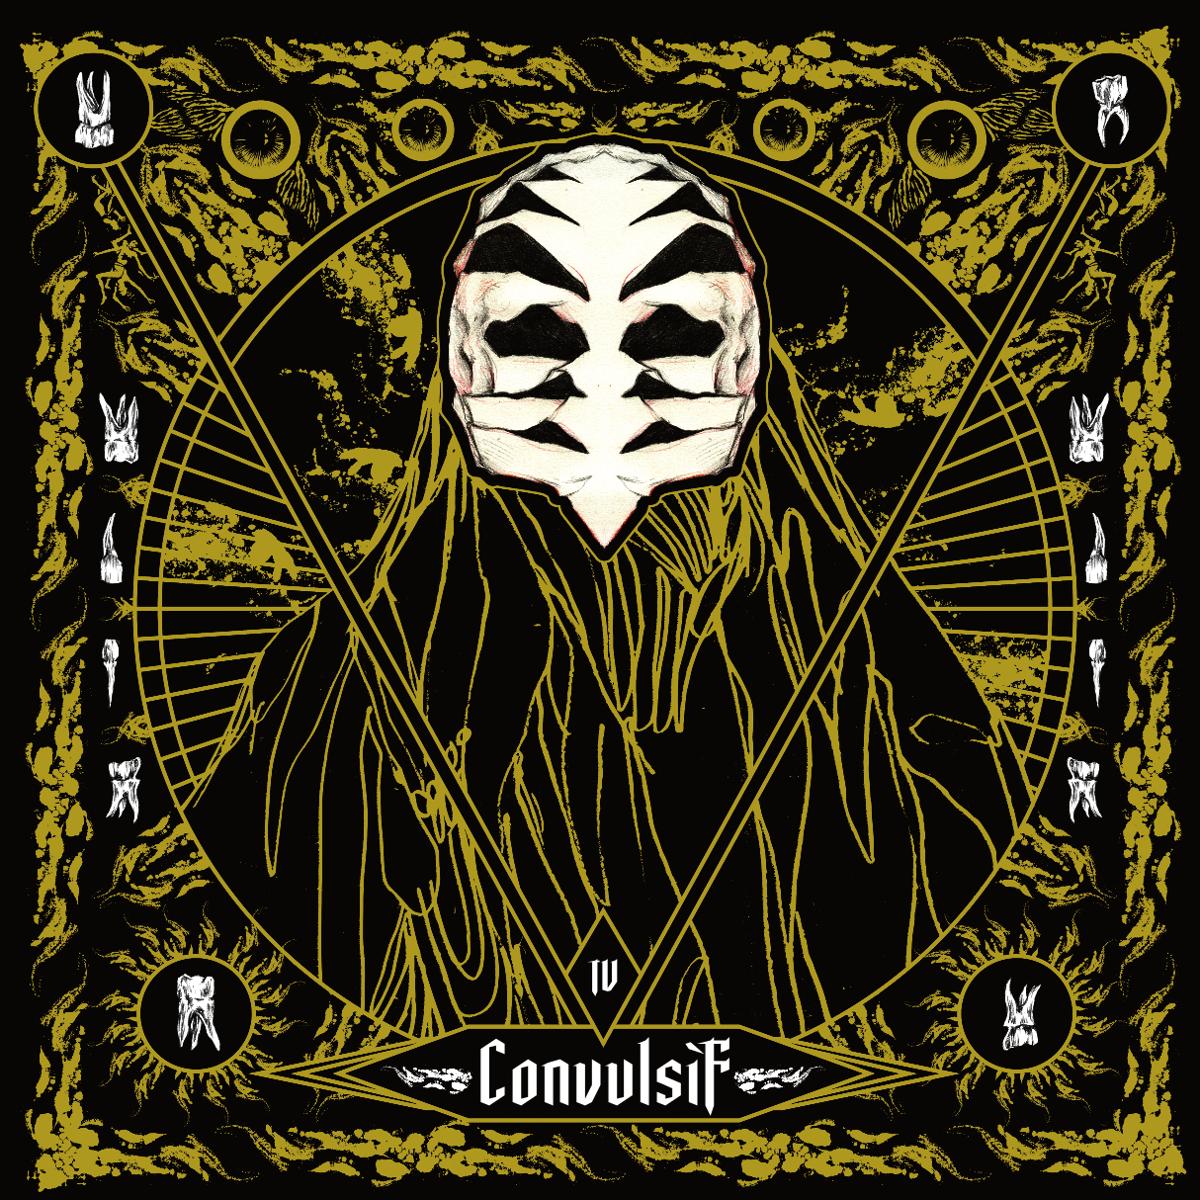 Cat #: CHEAP666/039 Release date: 14/10/2016 Format: LP/Digital   Labels:   Cheap Satanism Records / Tandori Records / Grinding Rebellion Records / ...   Distribution: Mandaï